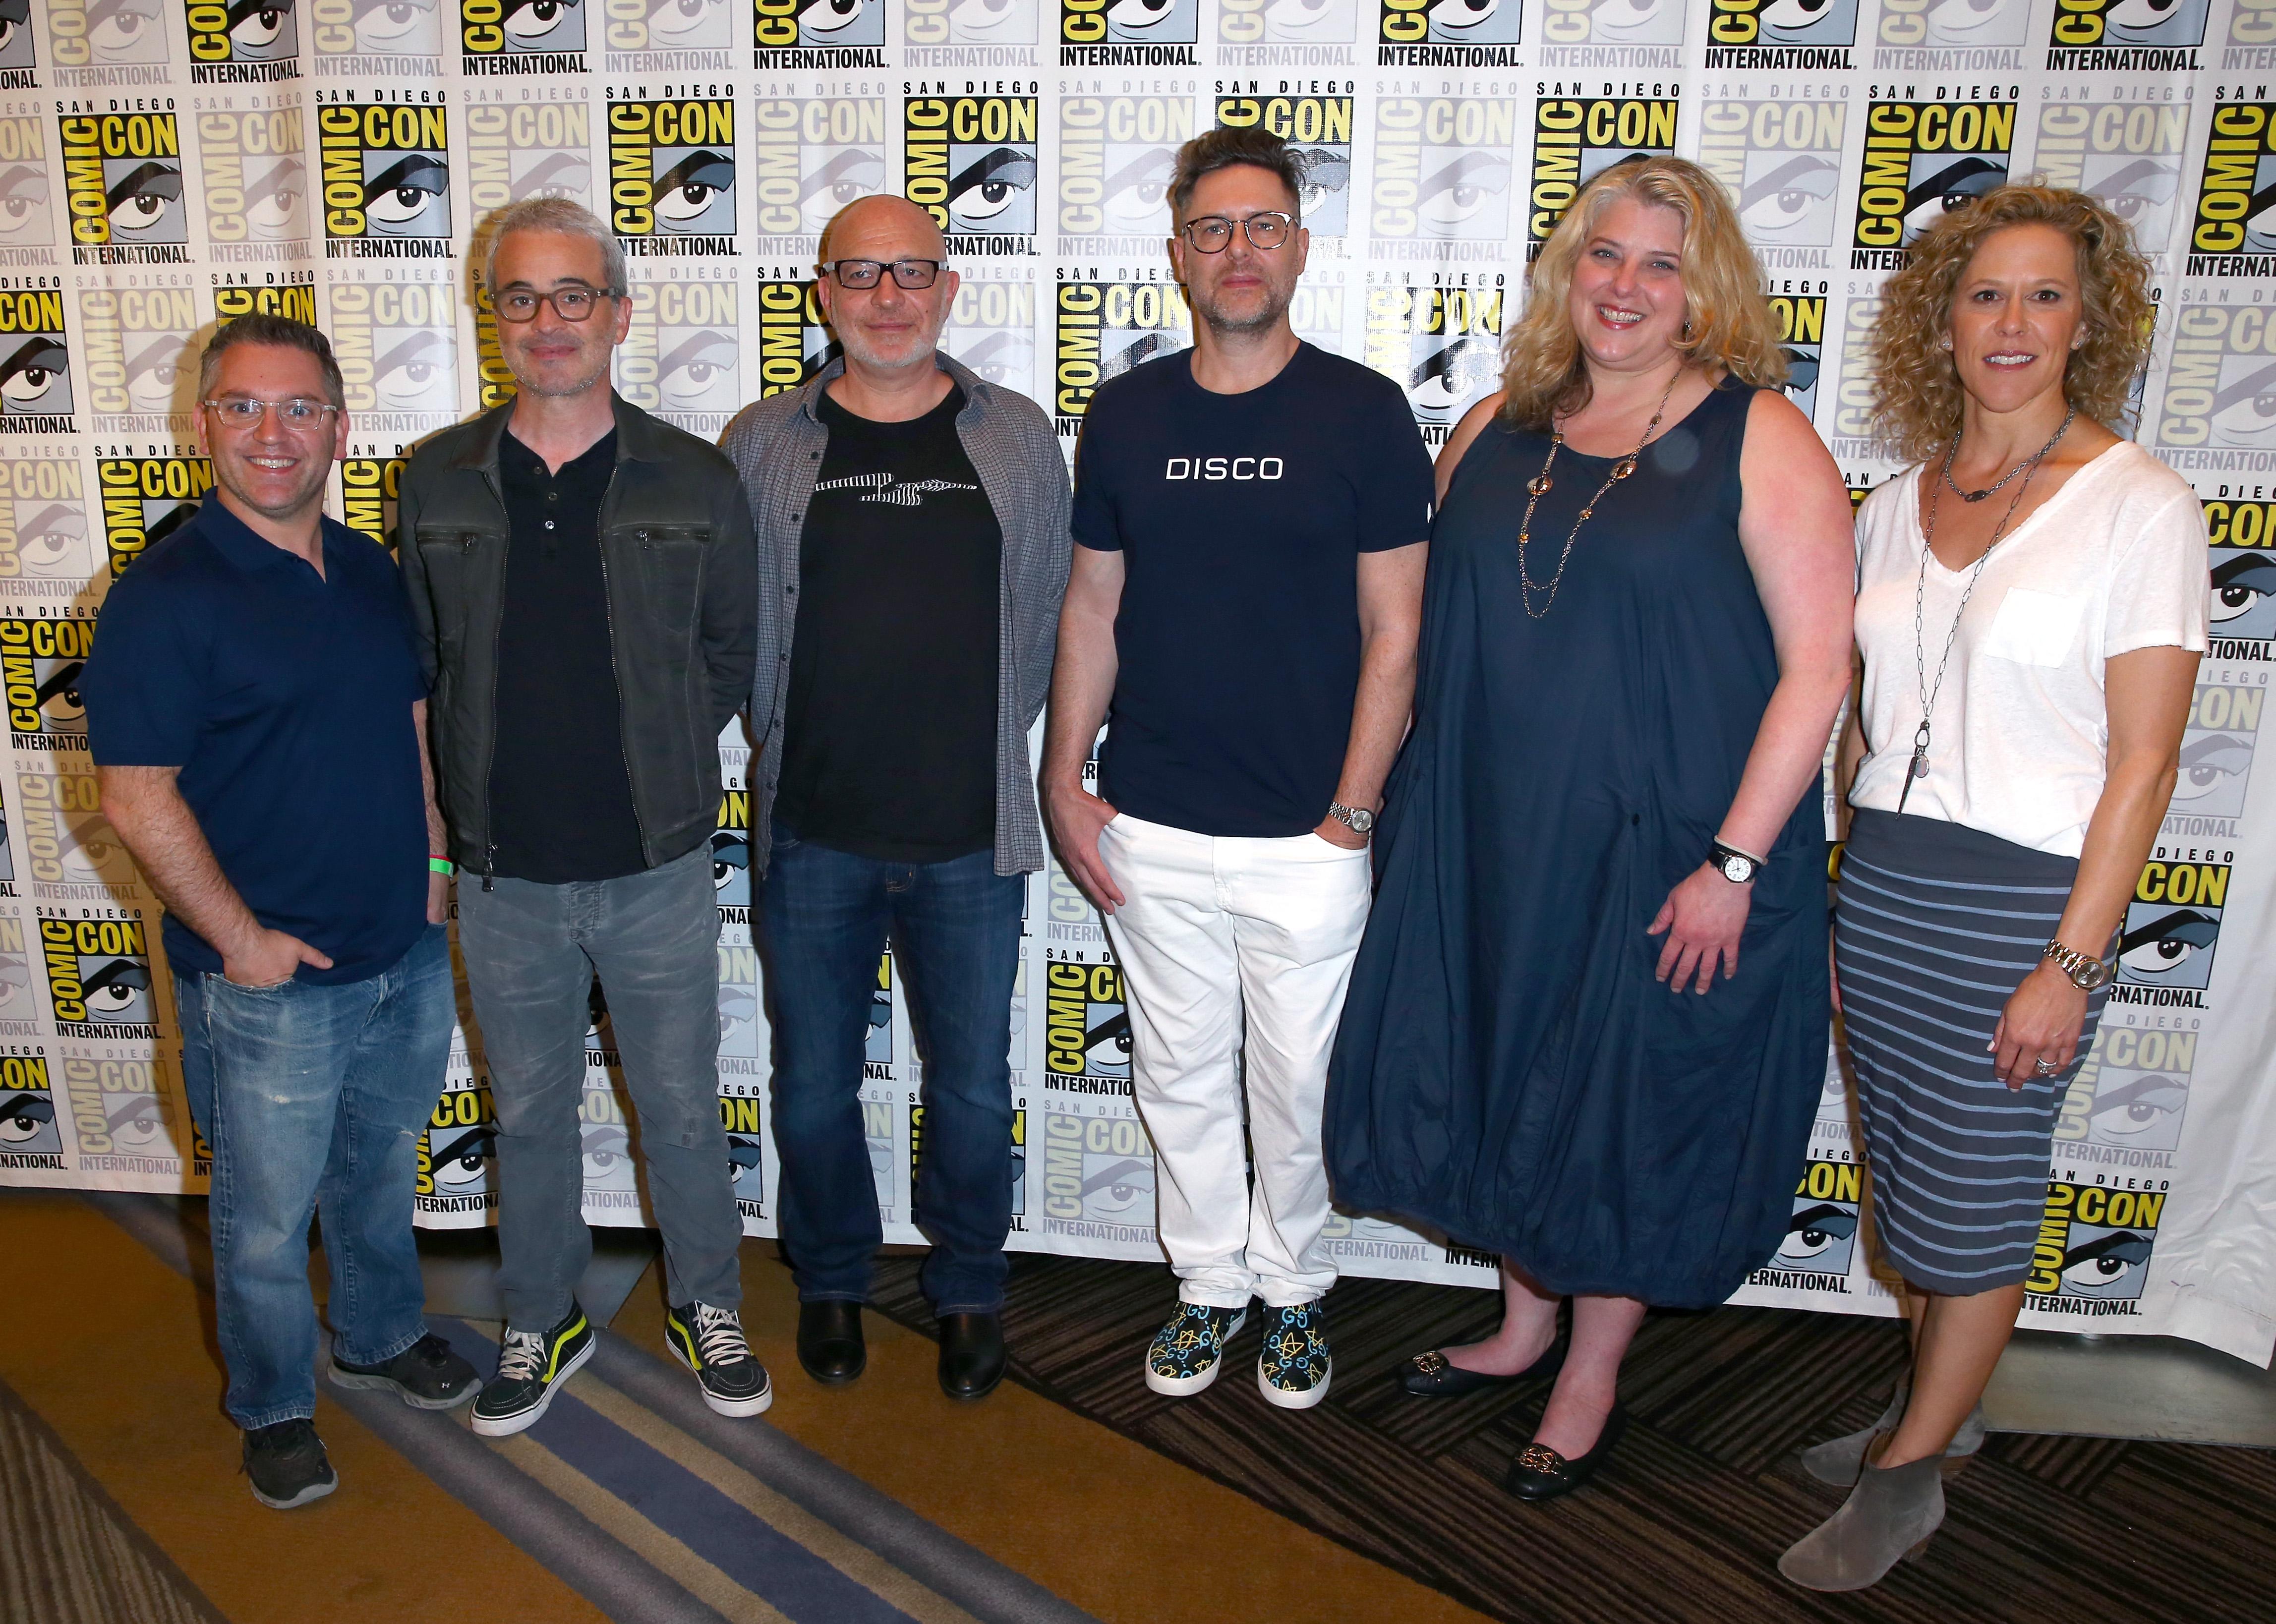 Gretchen J. Berg, Akiva Goldsman, Aaron Harberts, Alex Kurtzman, Trevor Roth, and Heather Kadin at an event for Star Trek: Discovery (2017)